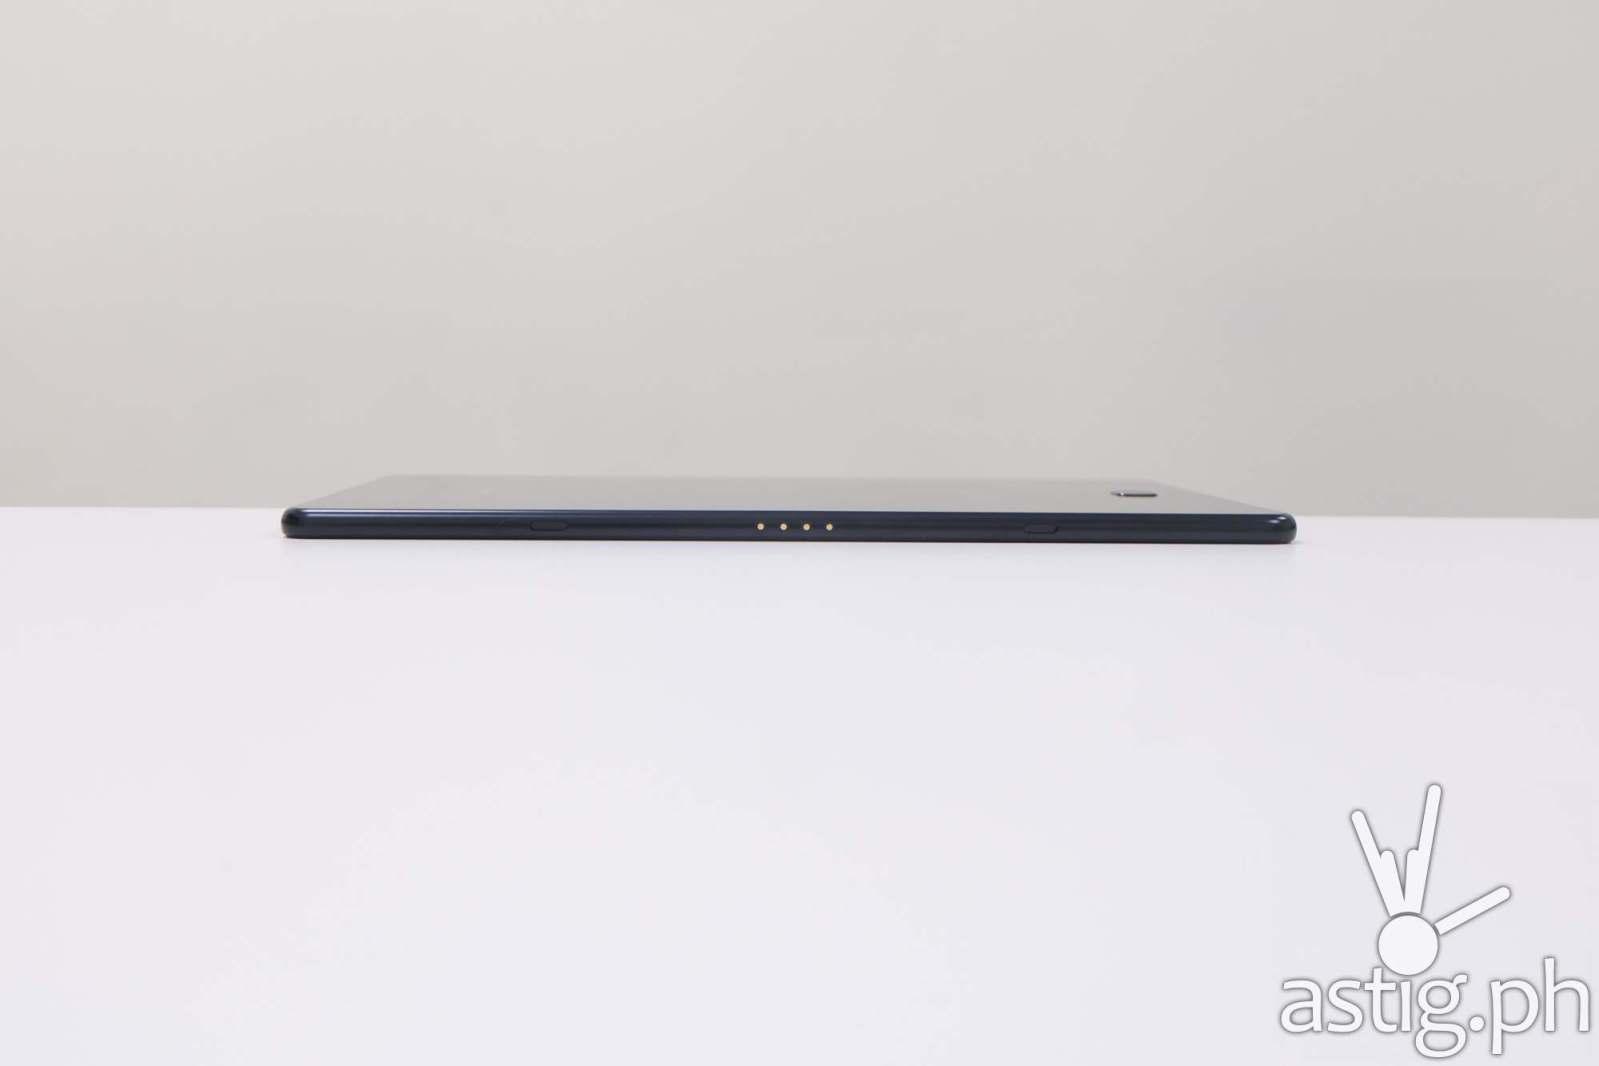 Side lying - Samsung Galaxy Tab S4 (Philippines)